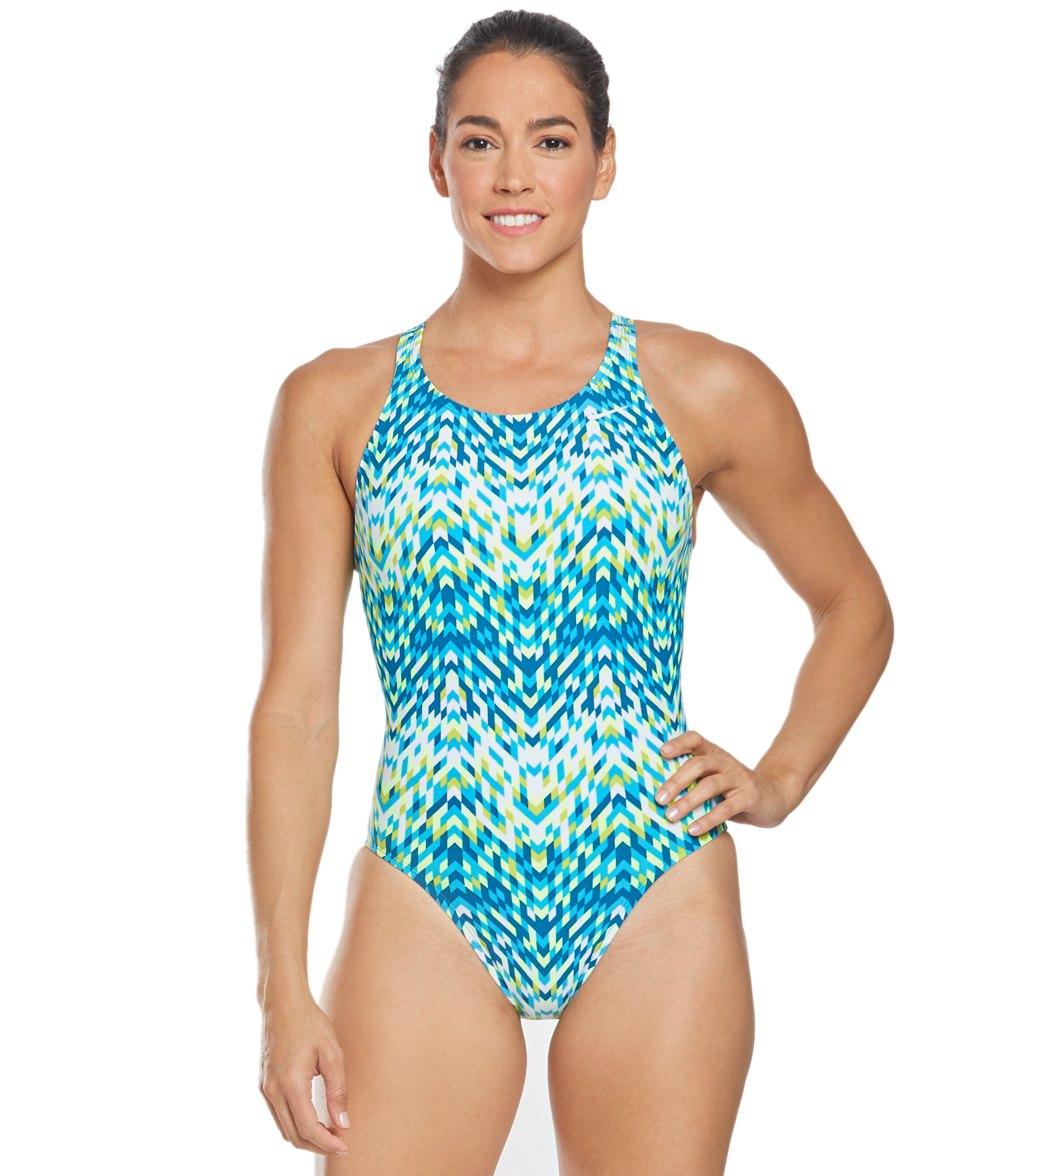 993b4355421f4 Nike Women's Digi Arrow Power Back One Piece Swimsuit at SwimOutlet.com -  Free Shipping